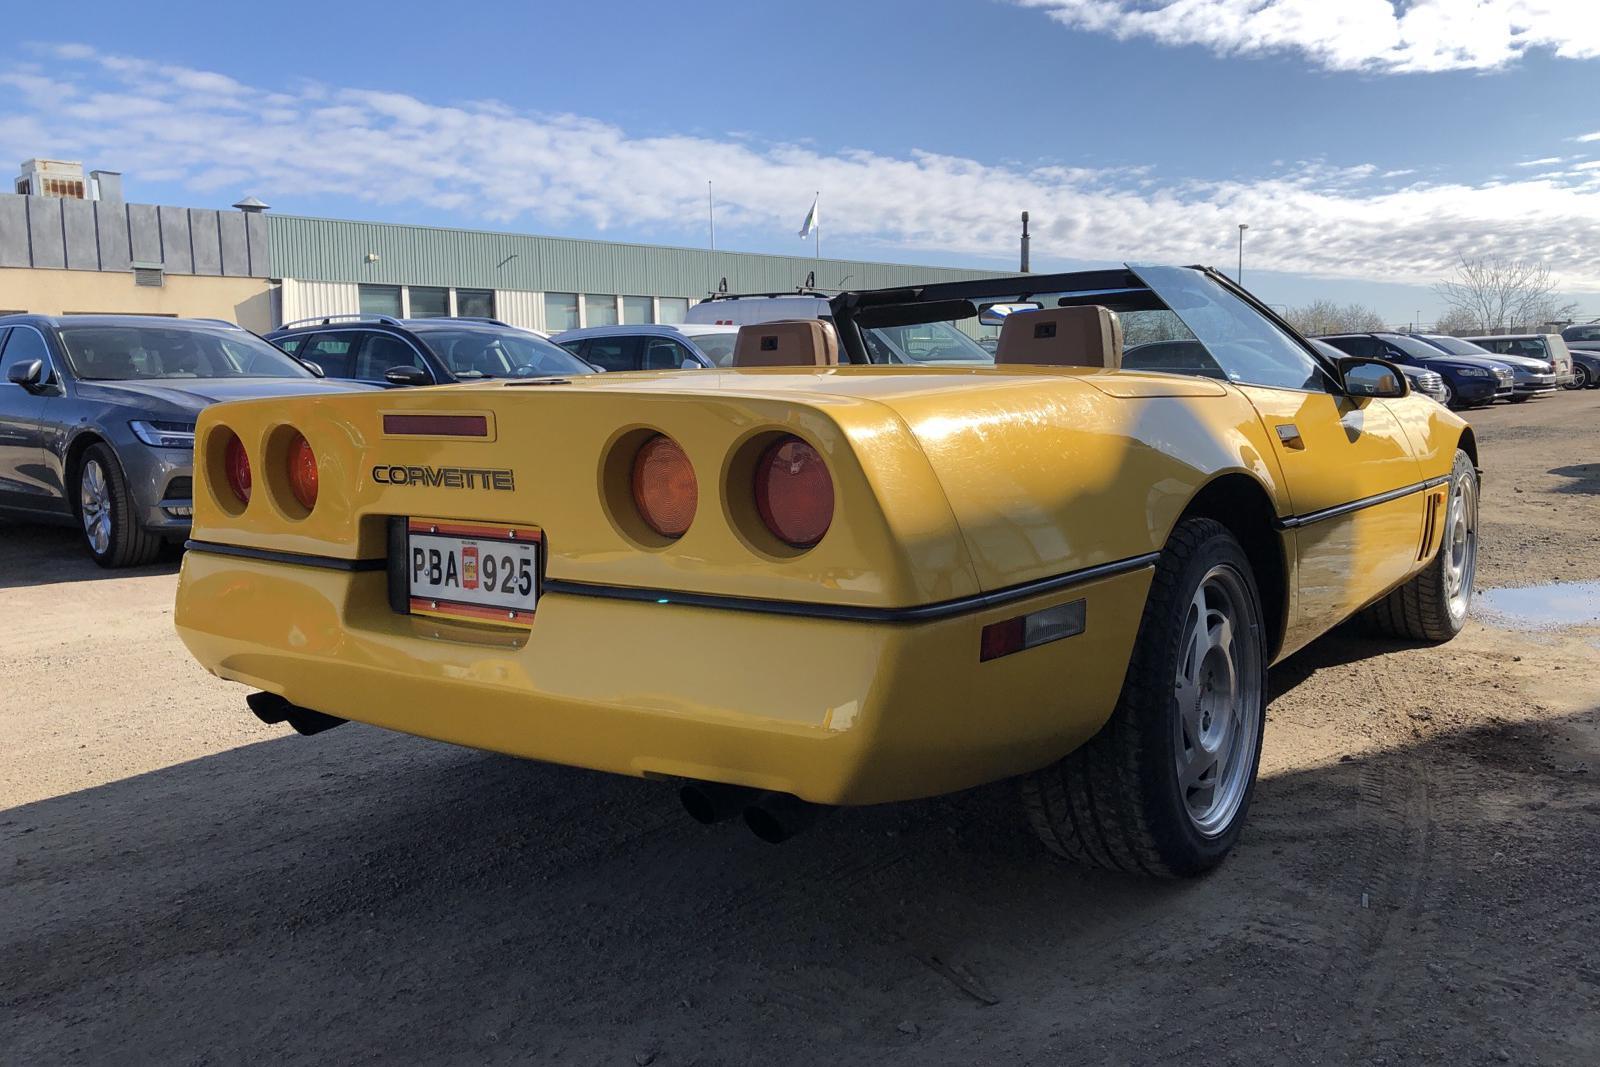 Chevrolet Corvette Cabriolet 5.7 V8 - 81 750 km - Automatic - yellow - 1990